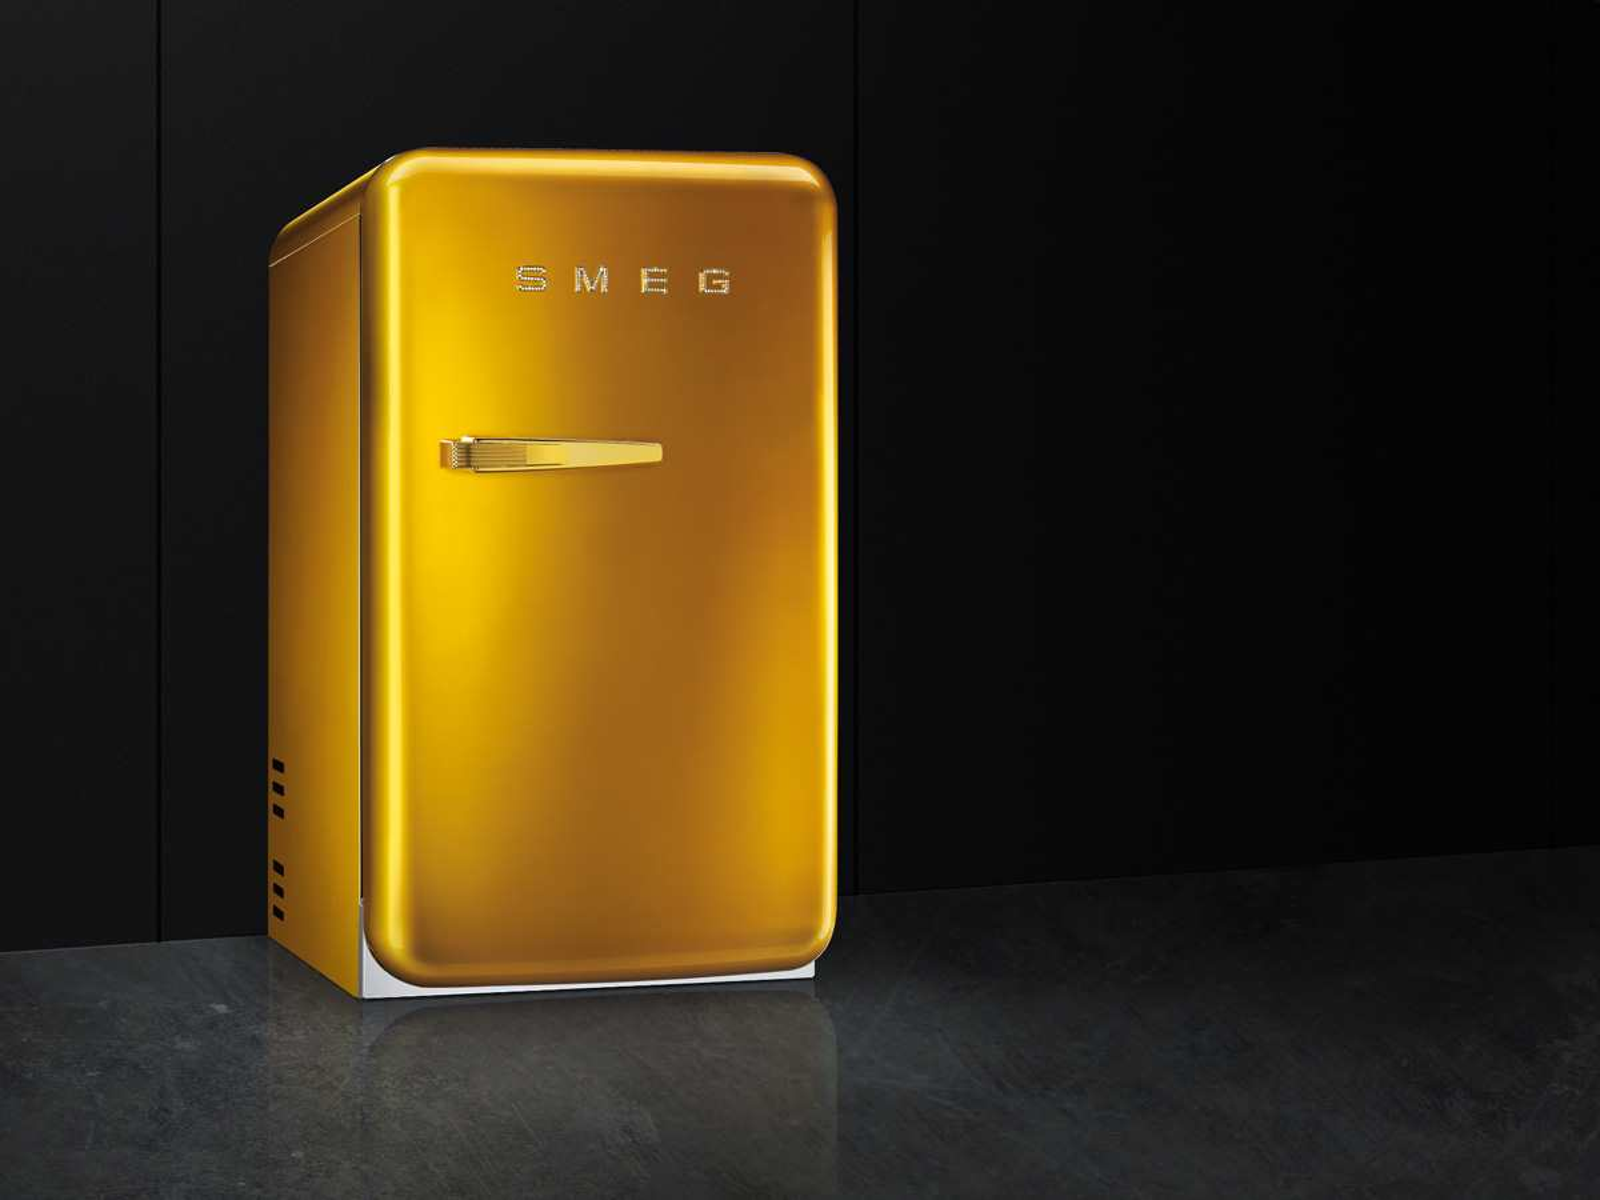 Smeg Kühlschrank Gold : Smeg fab5rgo stand flaschenkühlschrank gold swarowski